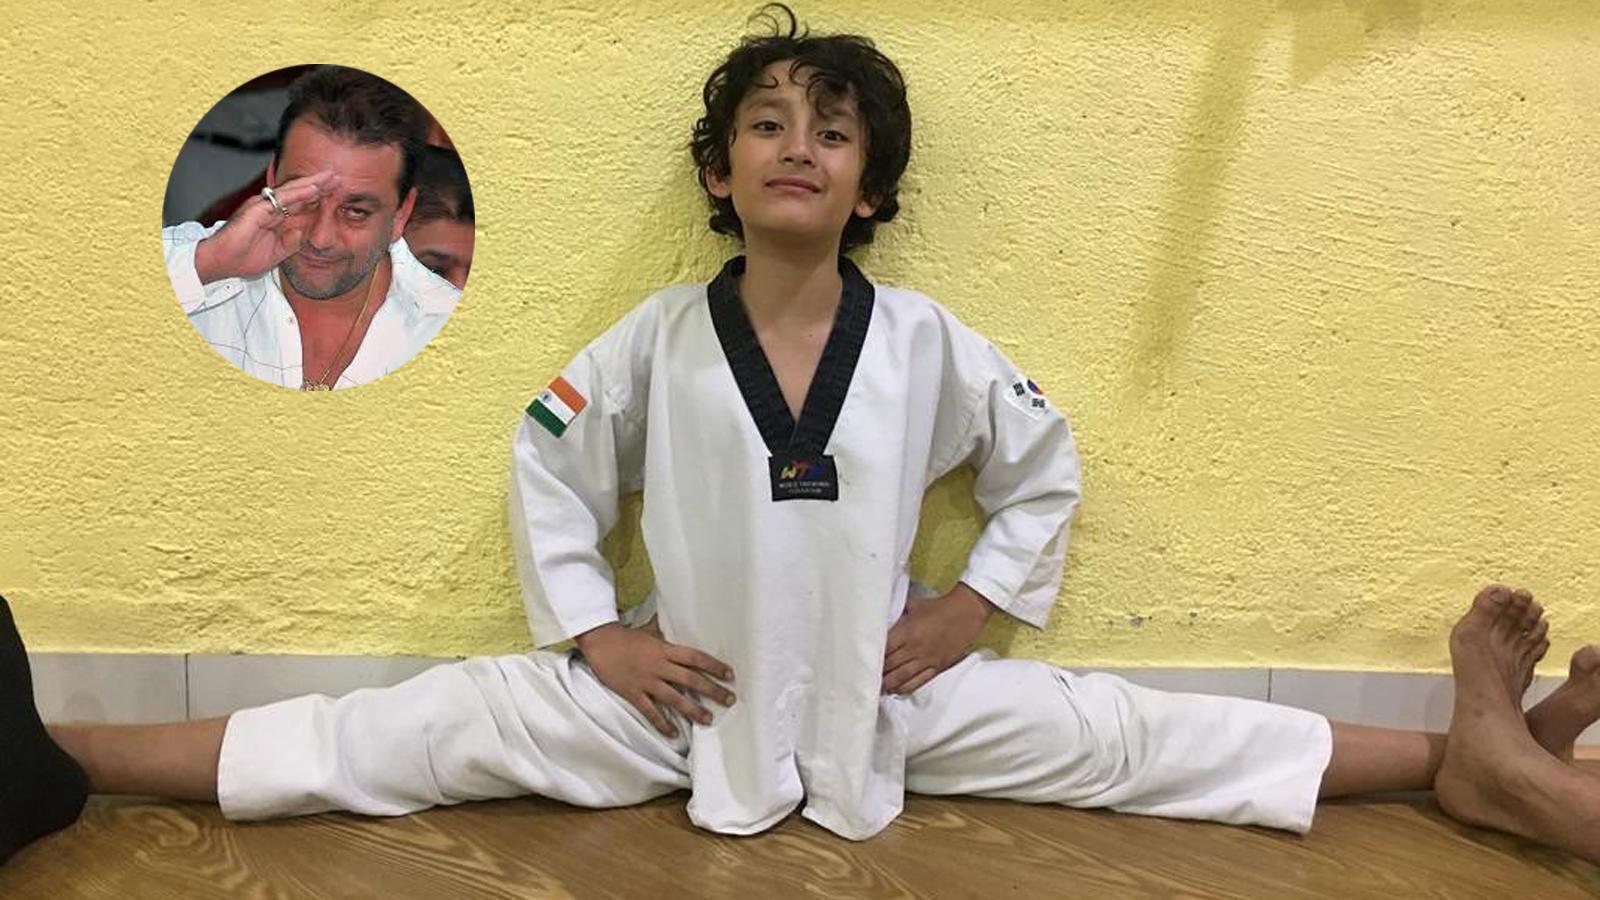 sanjay-dutt-is-proud-of-his-little-karate-kid